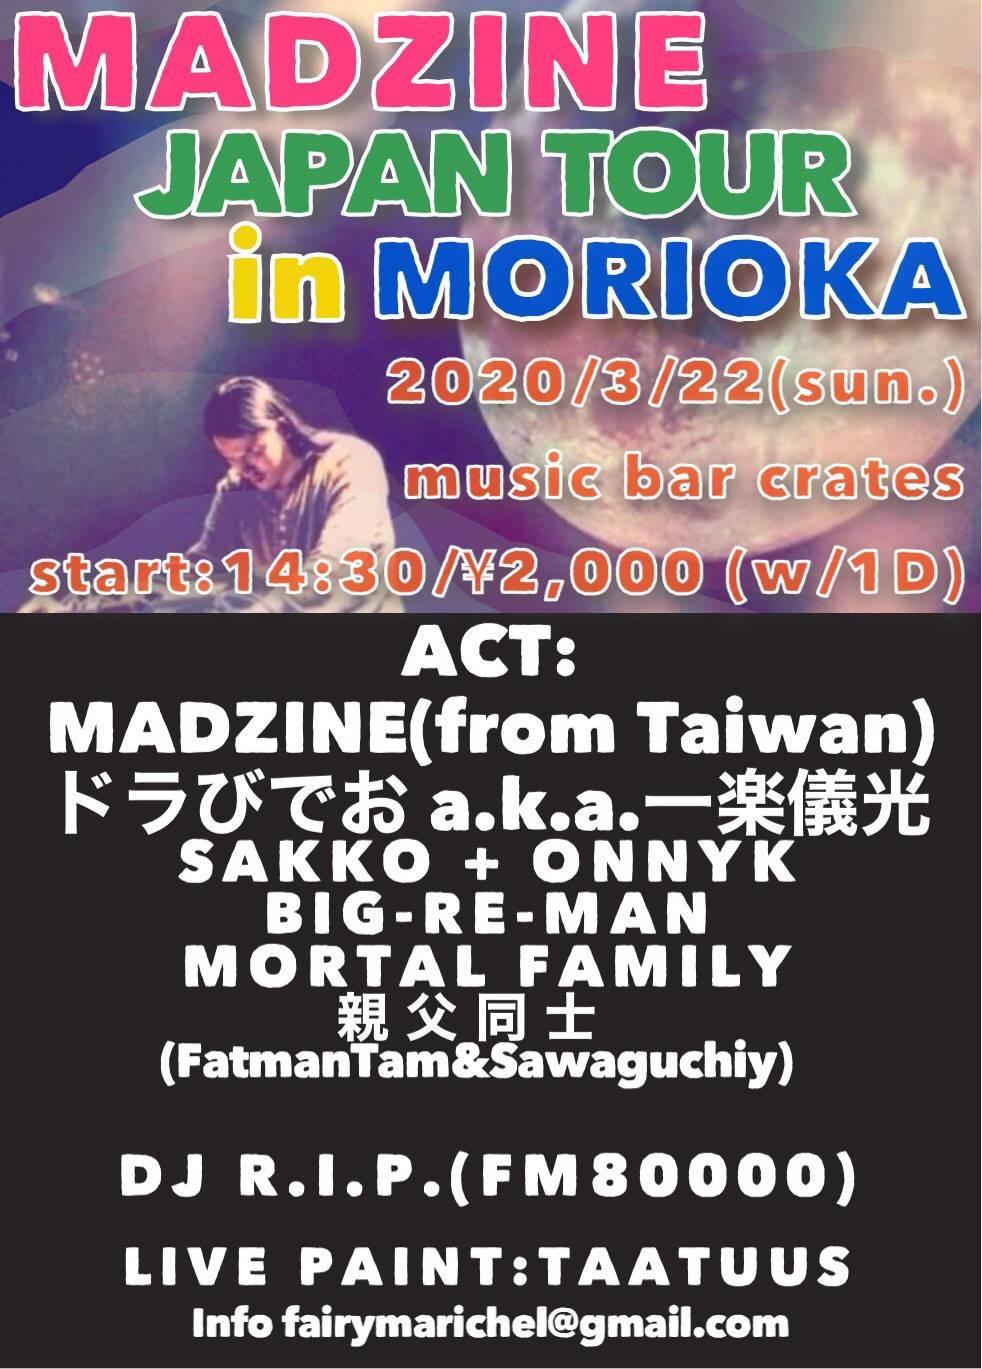 MADZINE JAPAN TOUR in MORIOKA